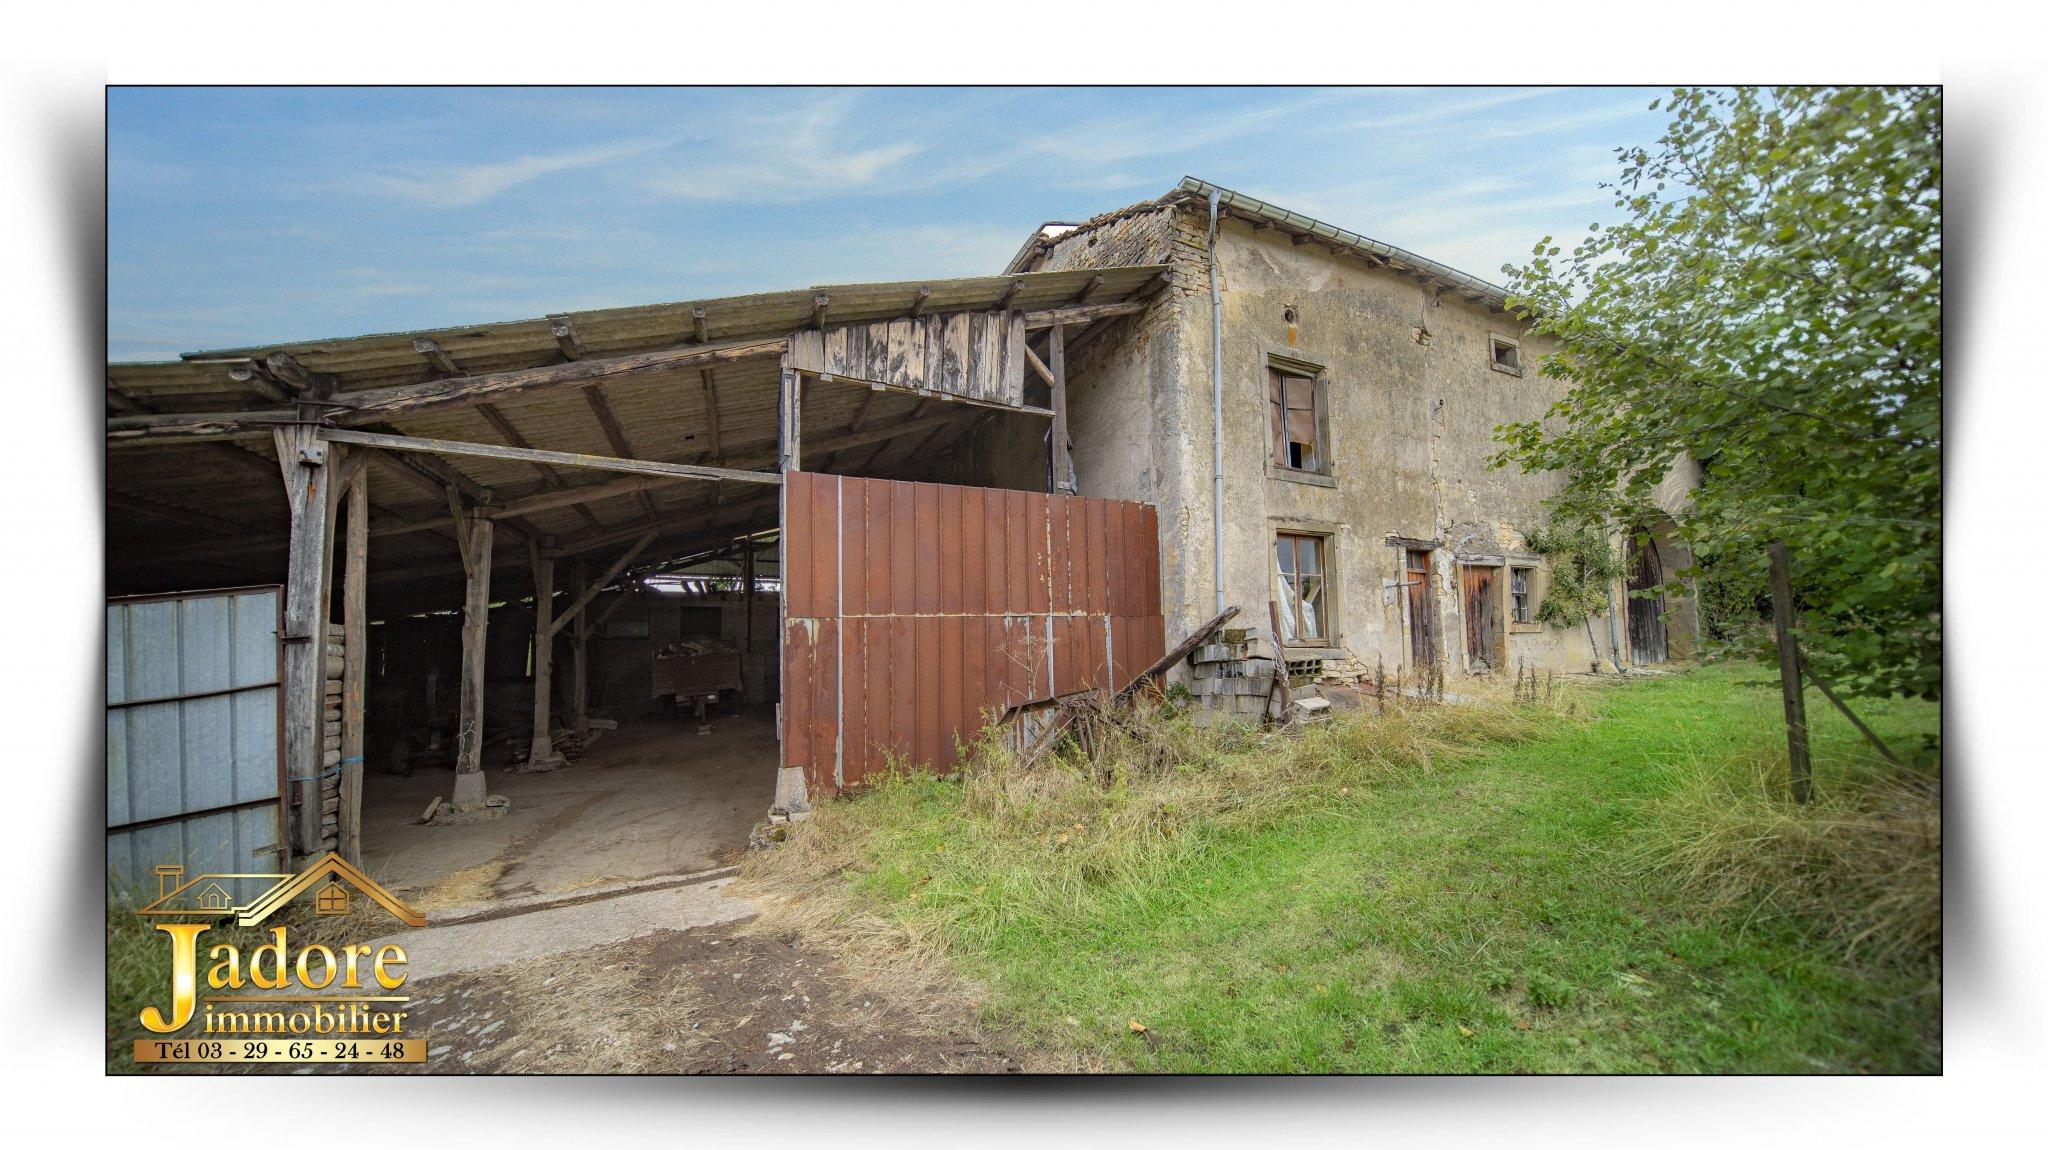 maison/villa à vendre mirecourt